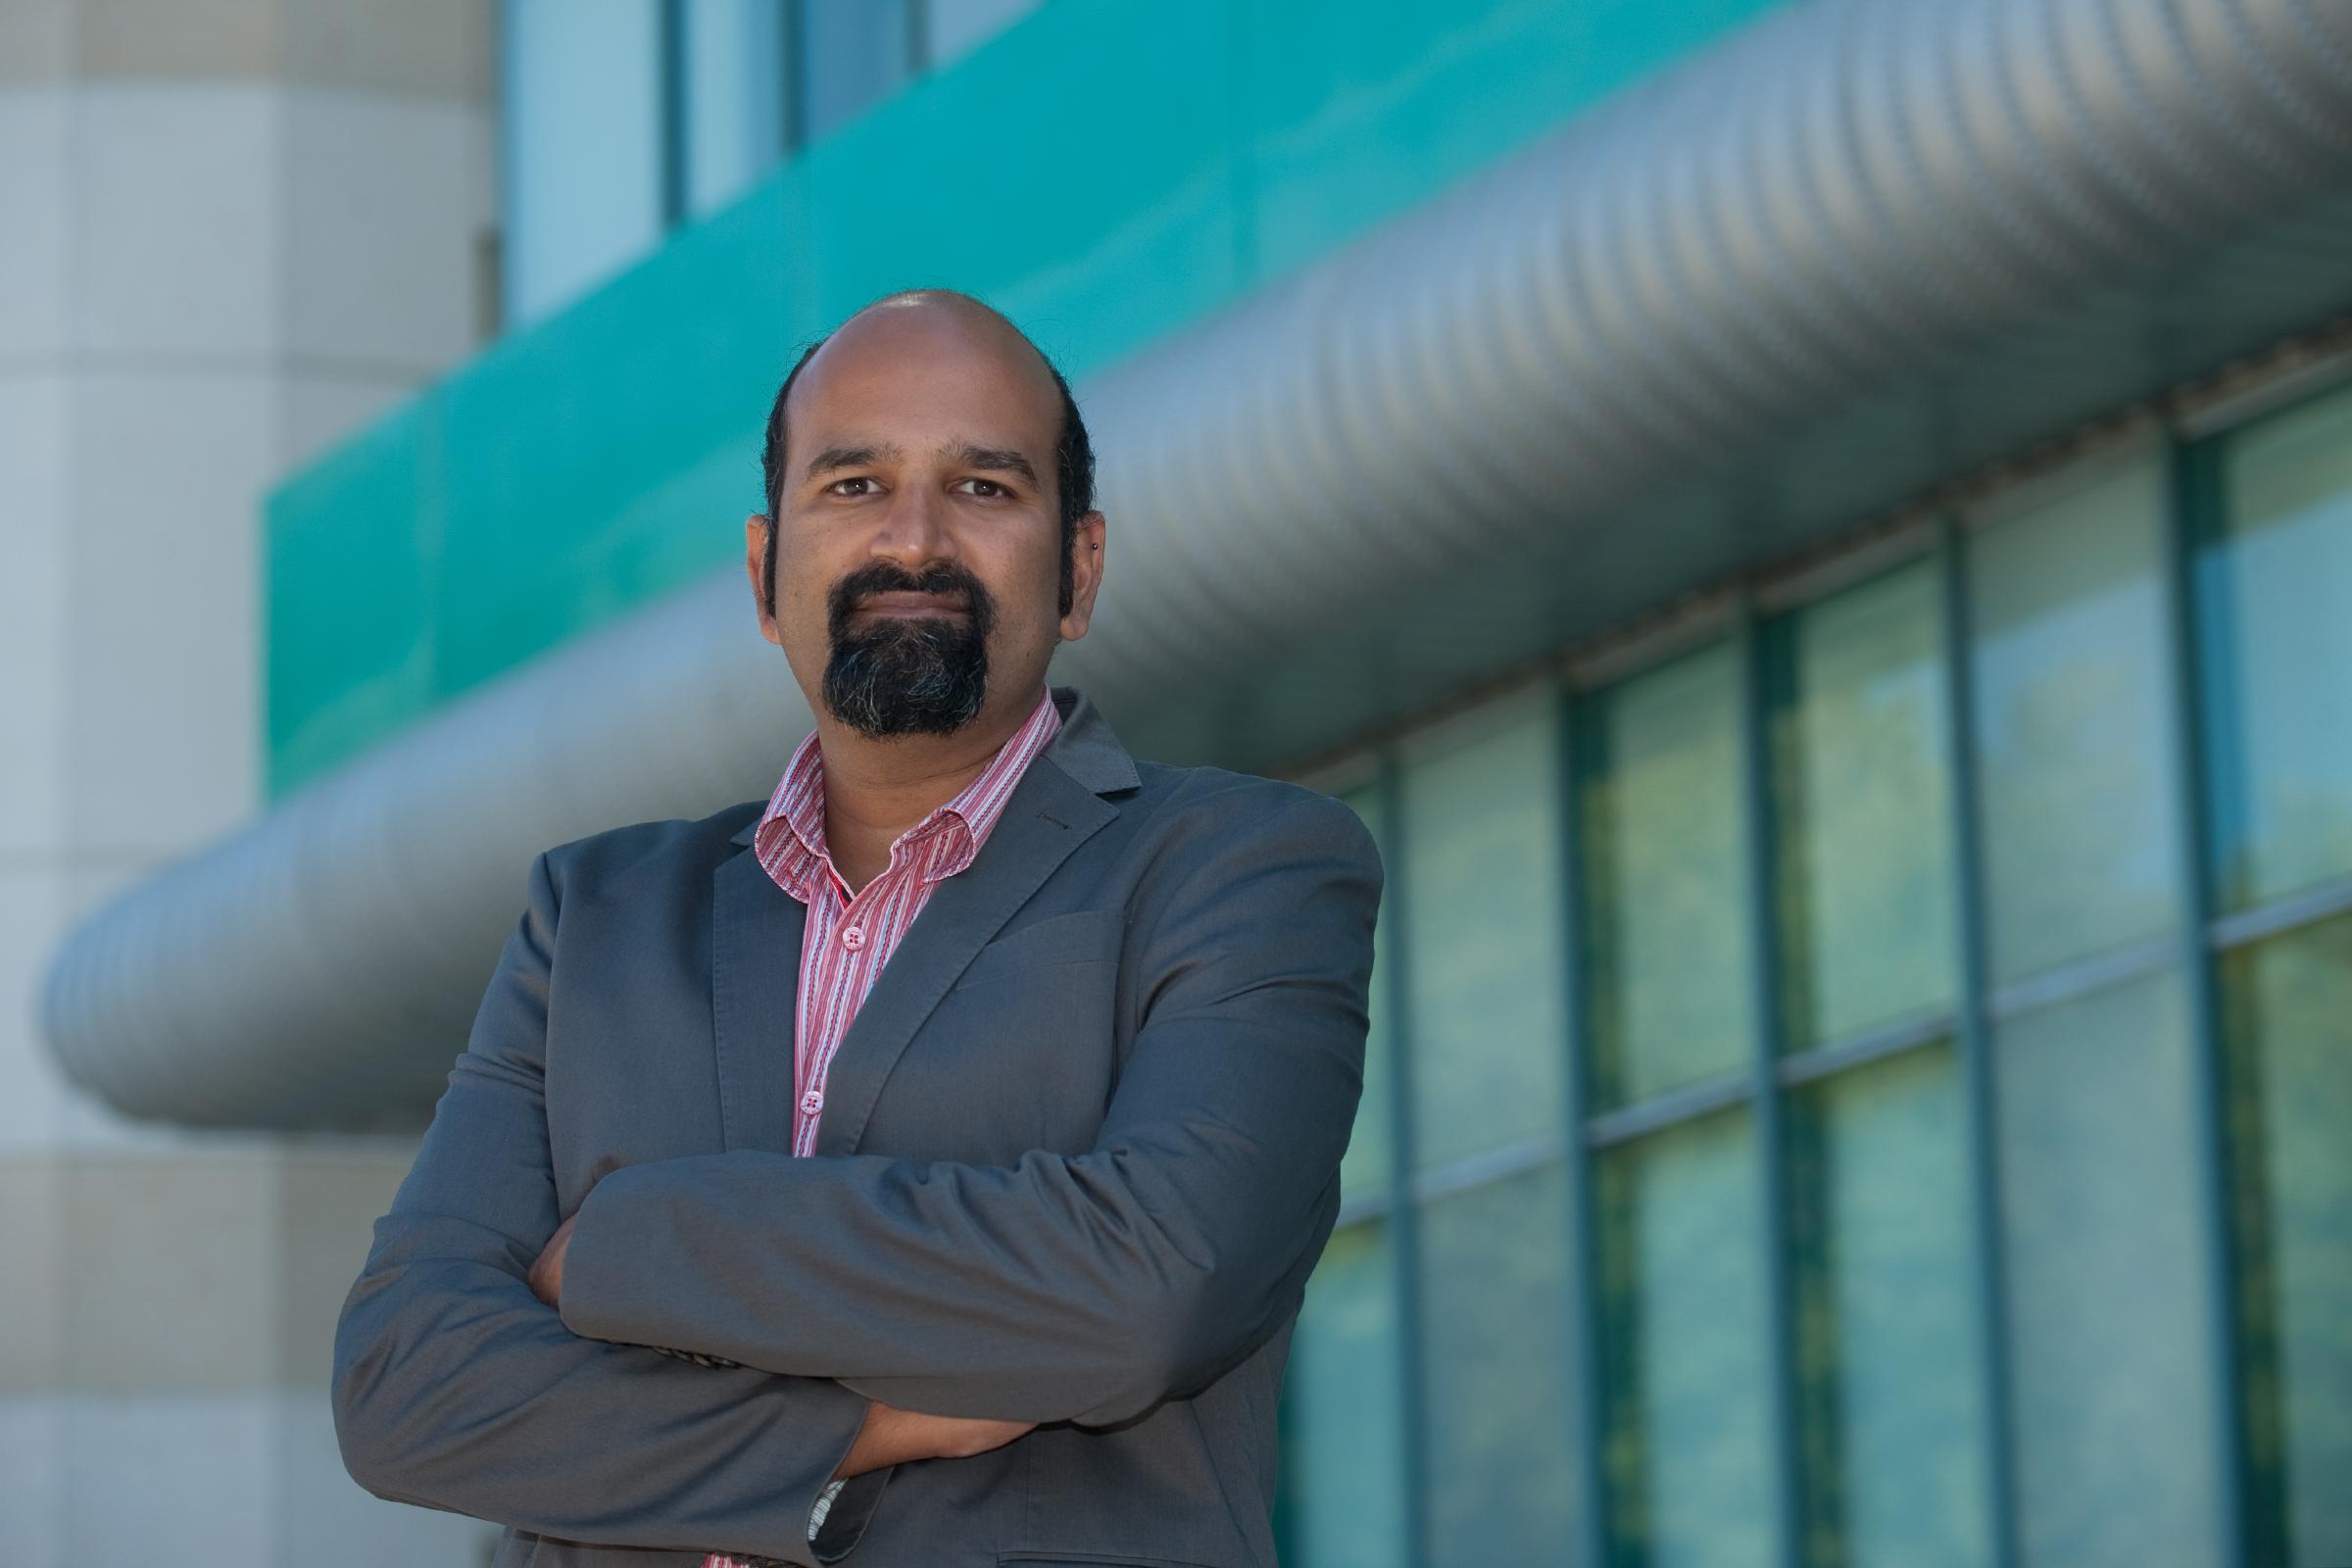 El neurobiólogo Sunil Gandhi. Imagen: Steve Zylius. Fuente: UC Irvine.